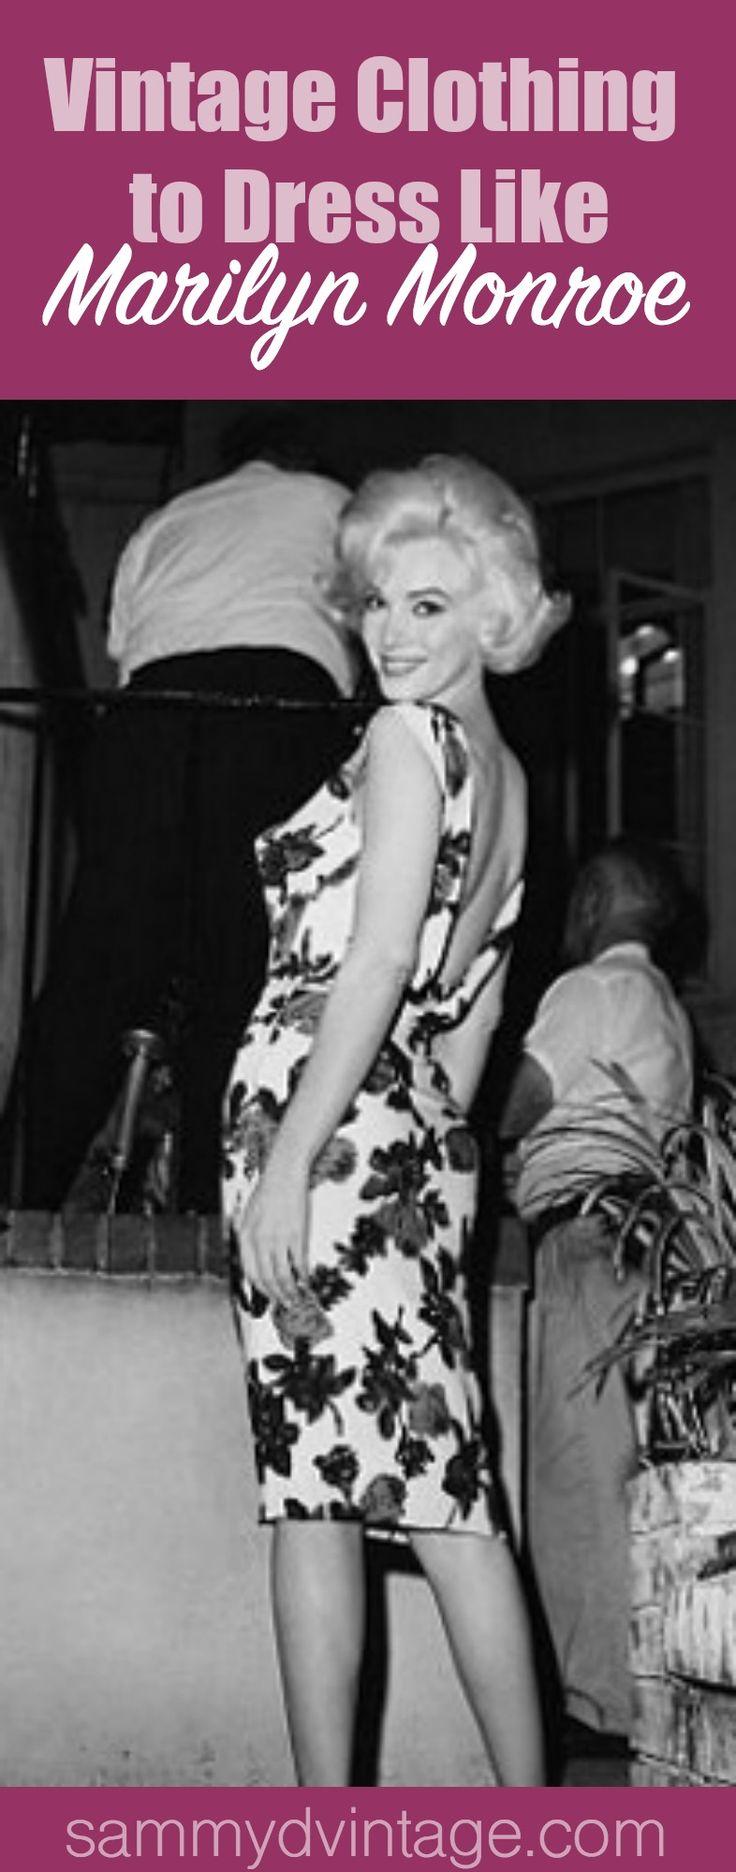 Where to Find Vintage Clothing to Dress Like Marilyn Monroe   Retro Fashion Tips & Ideas.